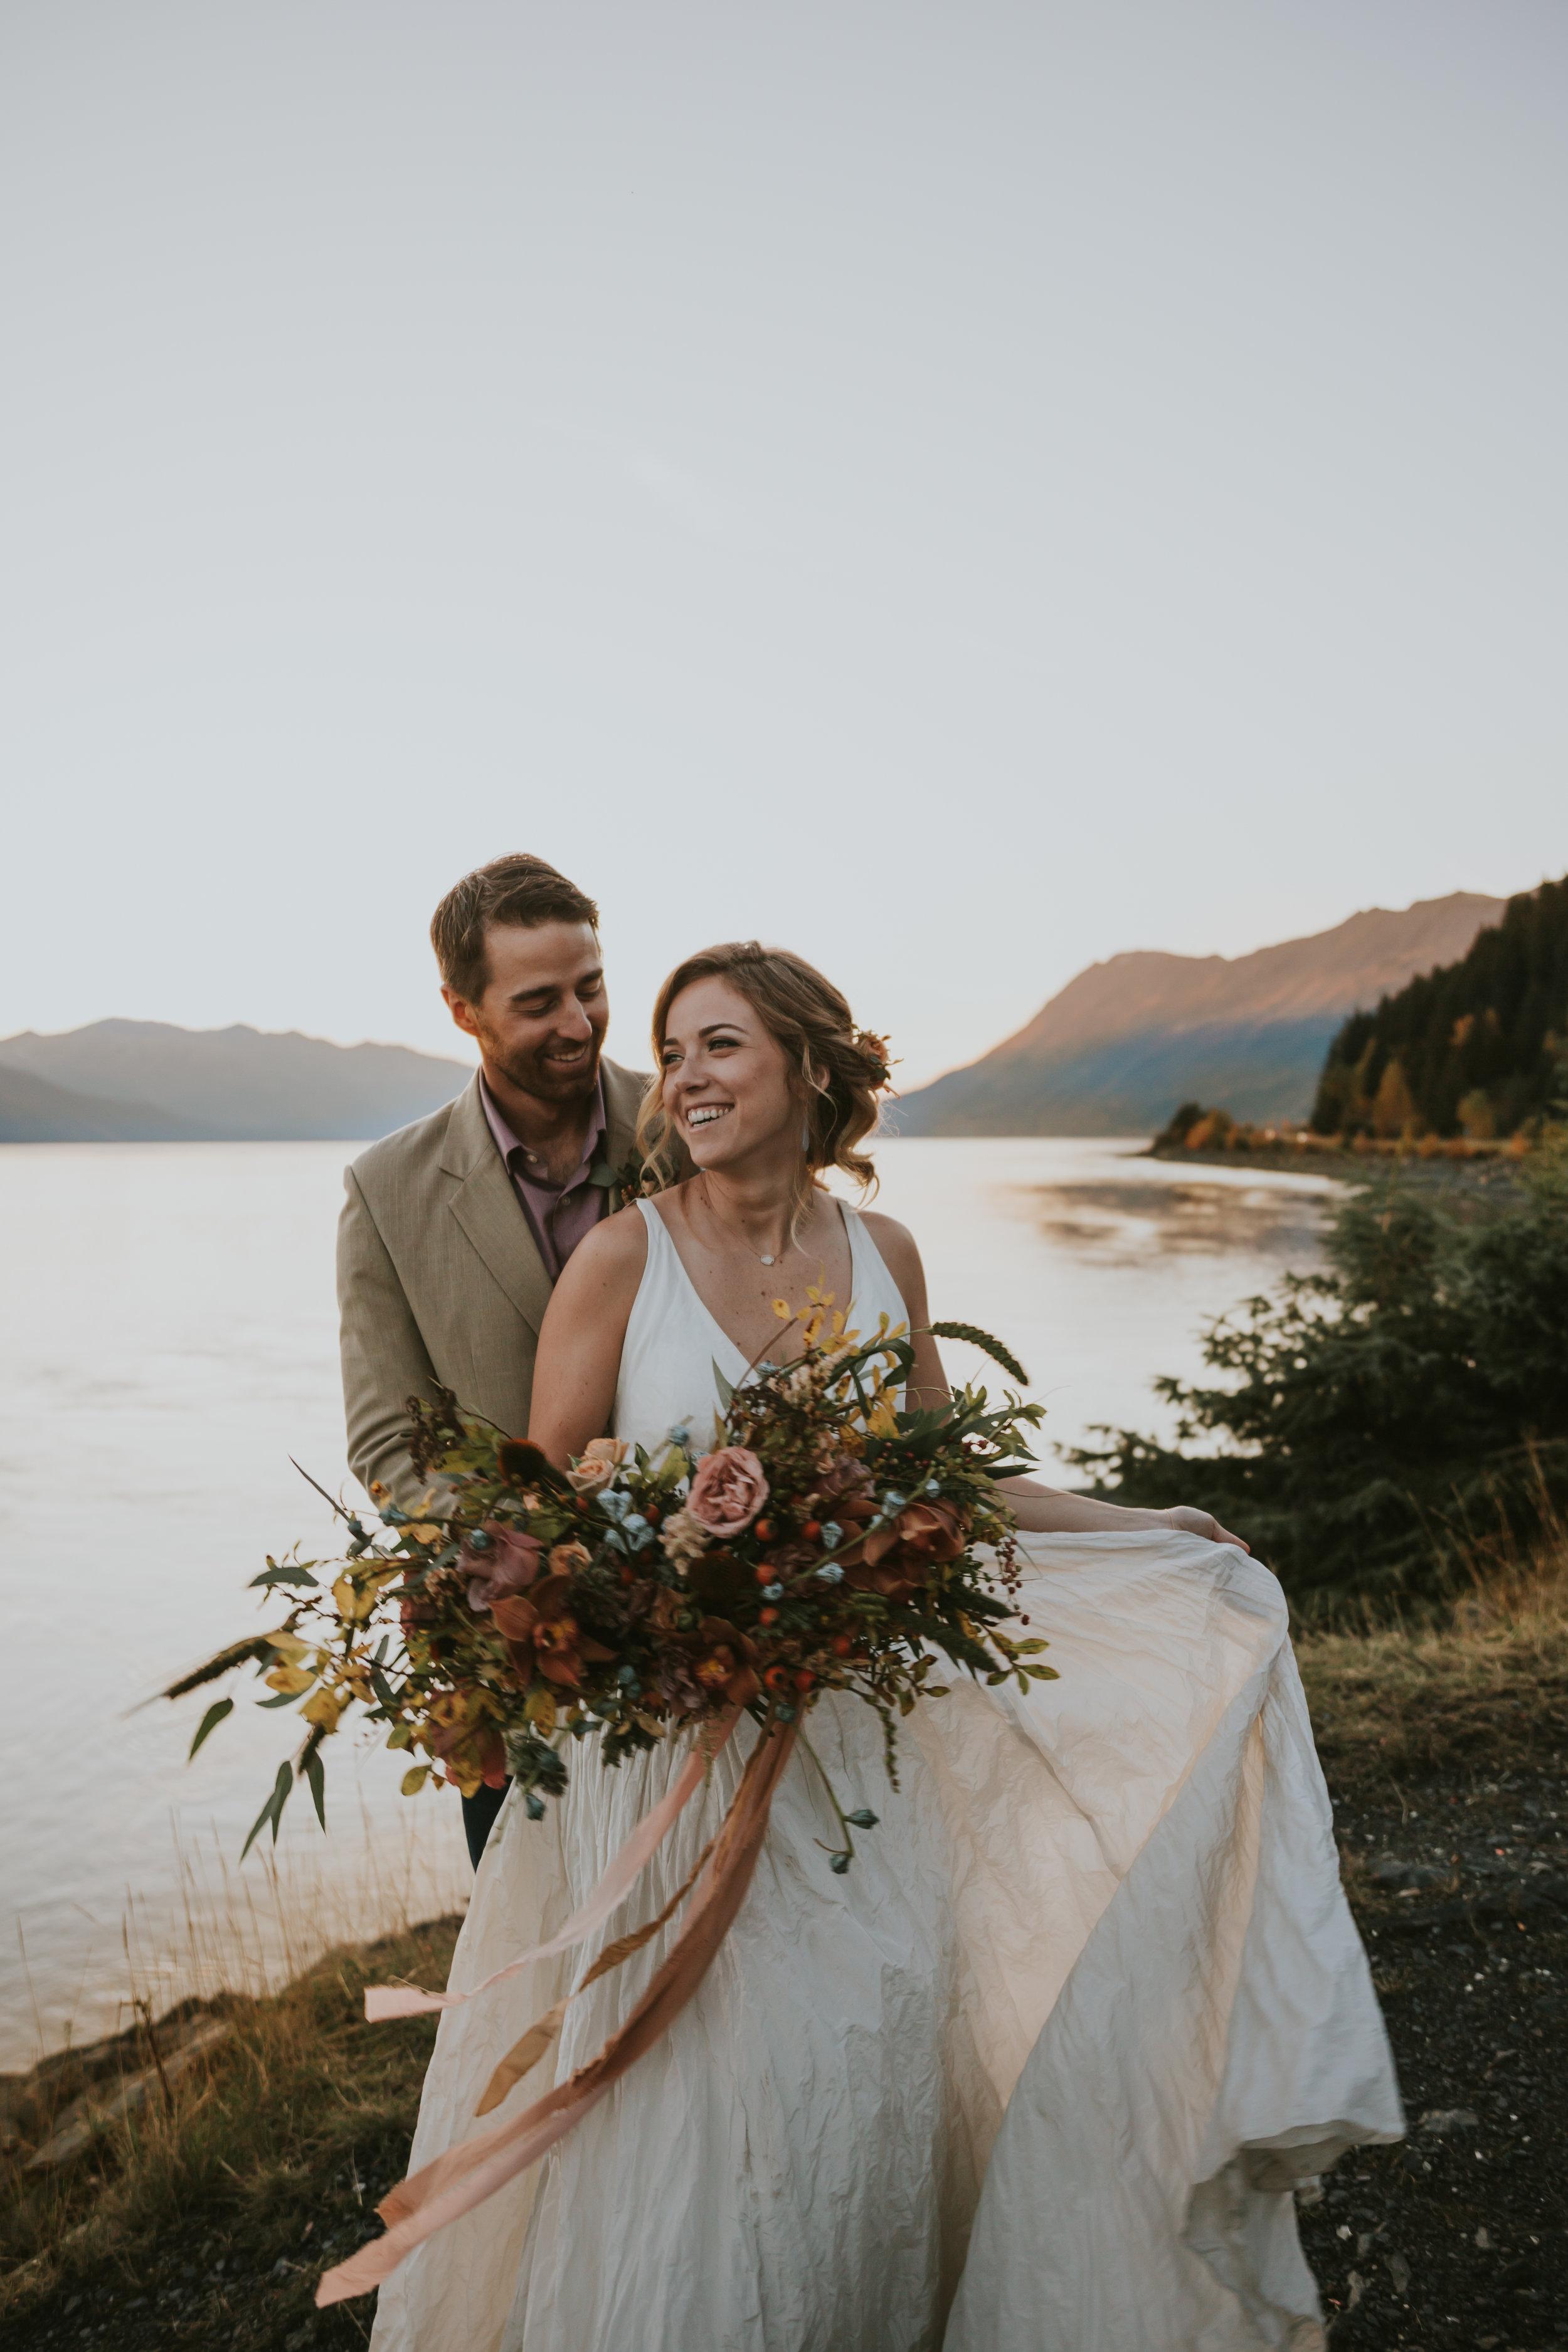 LINDSEY AND ERIC WEDDING - GIRDWOOD, ALASKA